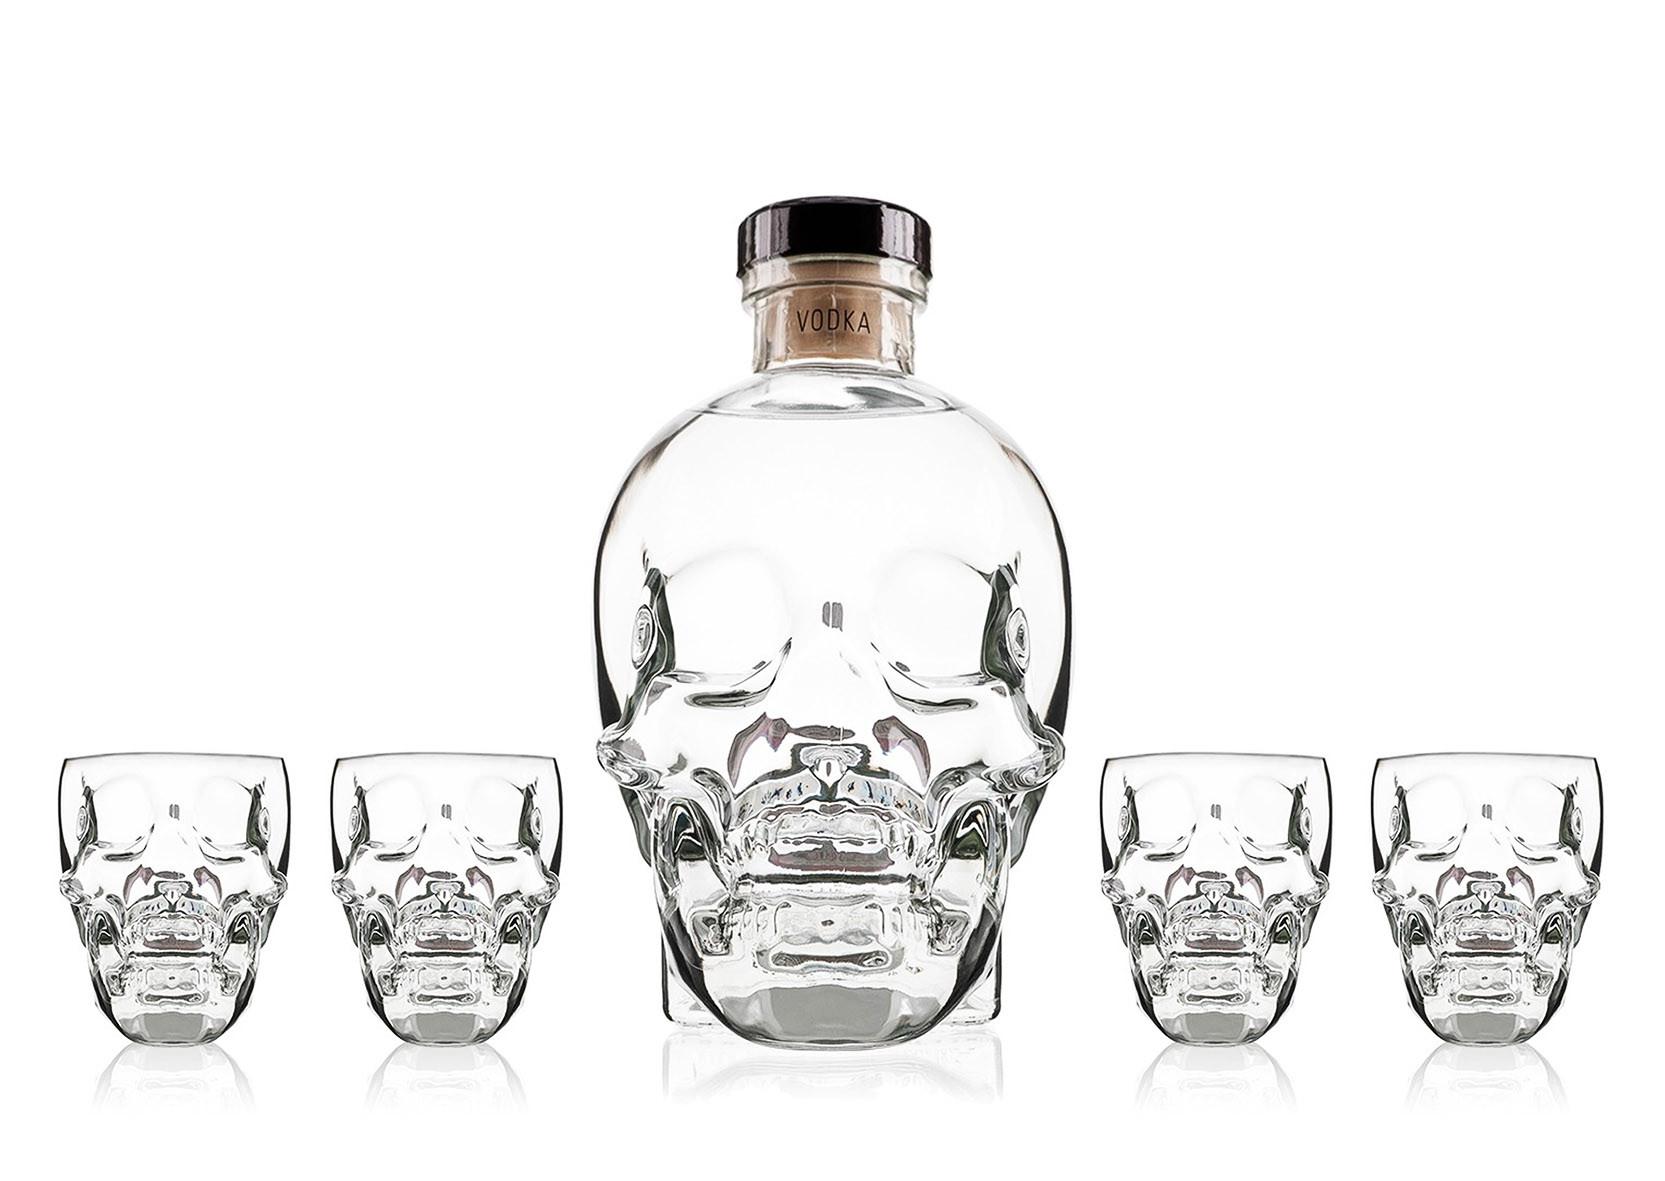 Vodka Crystal Head 70cl Coffret 4 Verres www.odyssee-vins.com